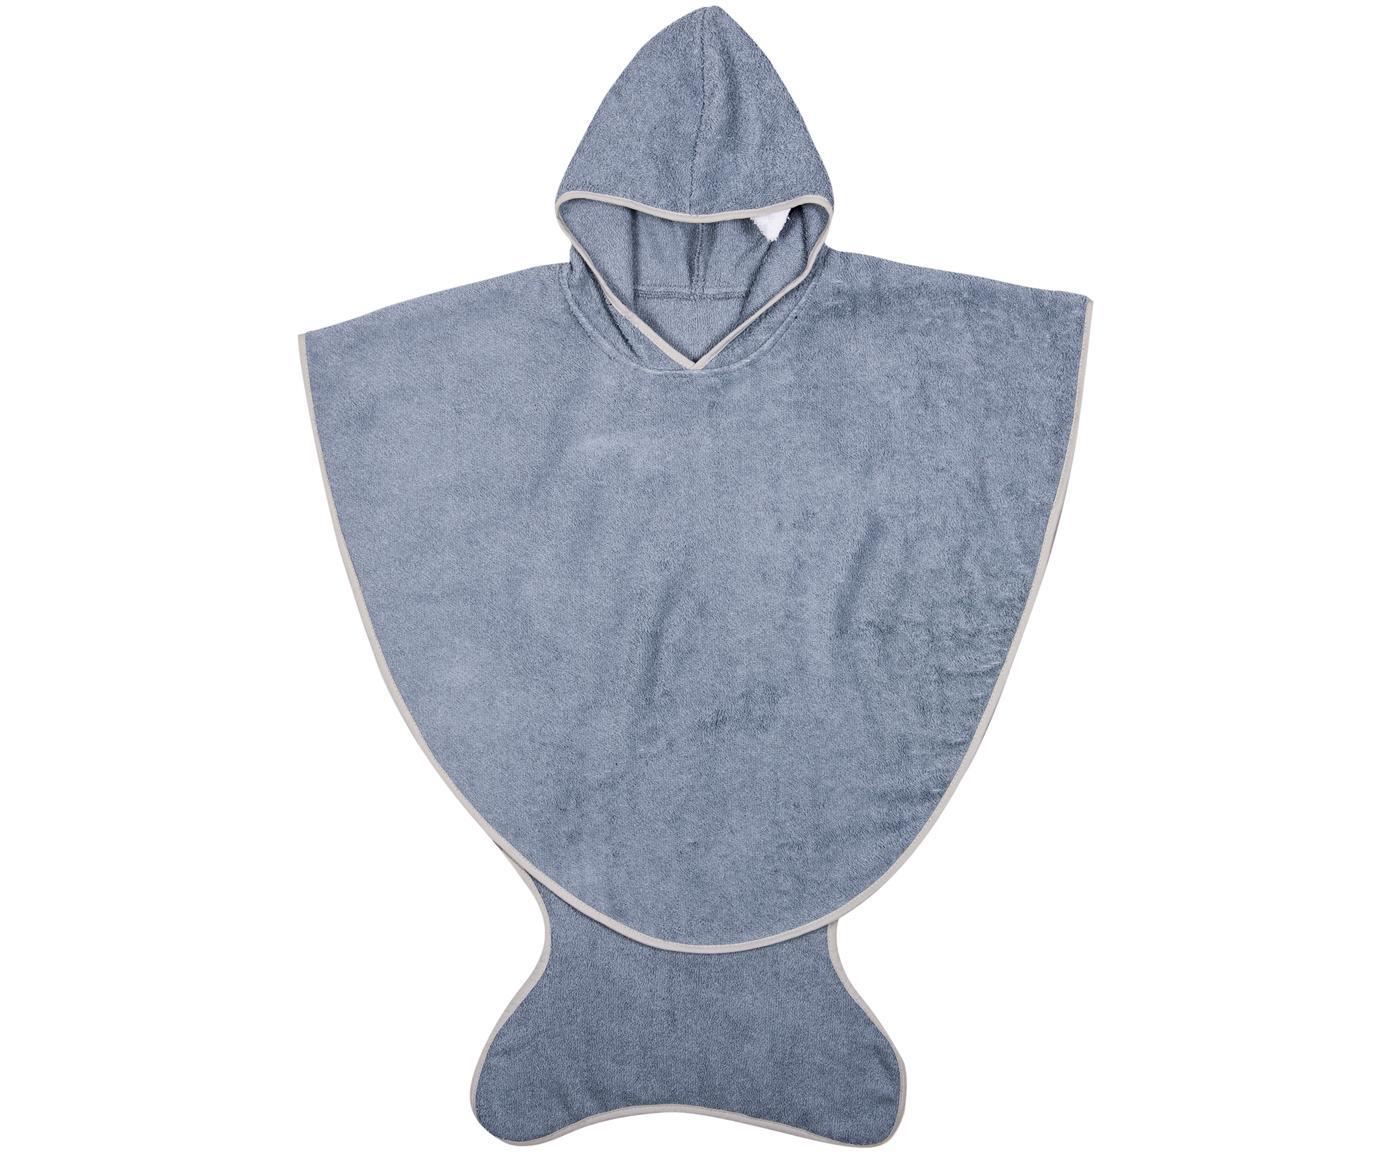 Asciugamano per bambini Fish, Cotone, Blu grigio, Larg. 71 x Alt. 120 cm